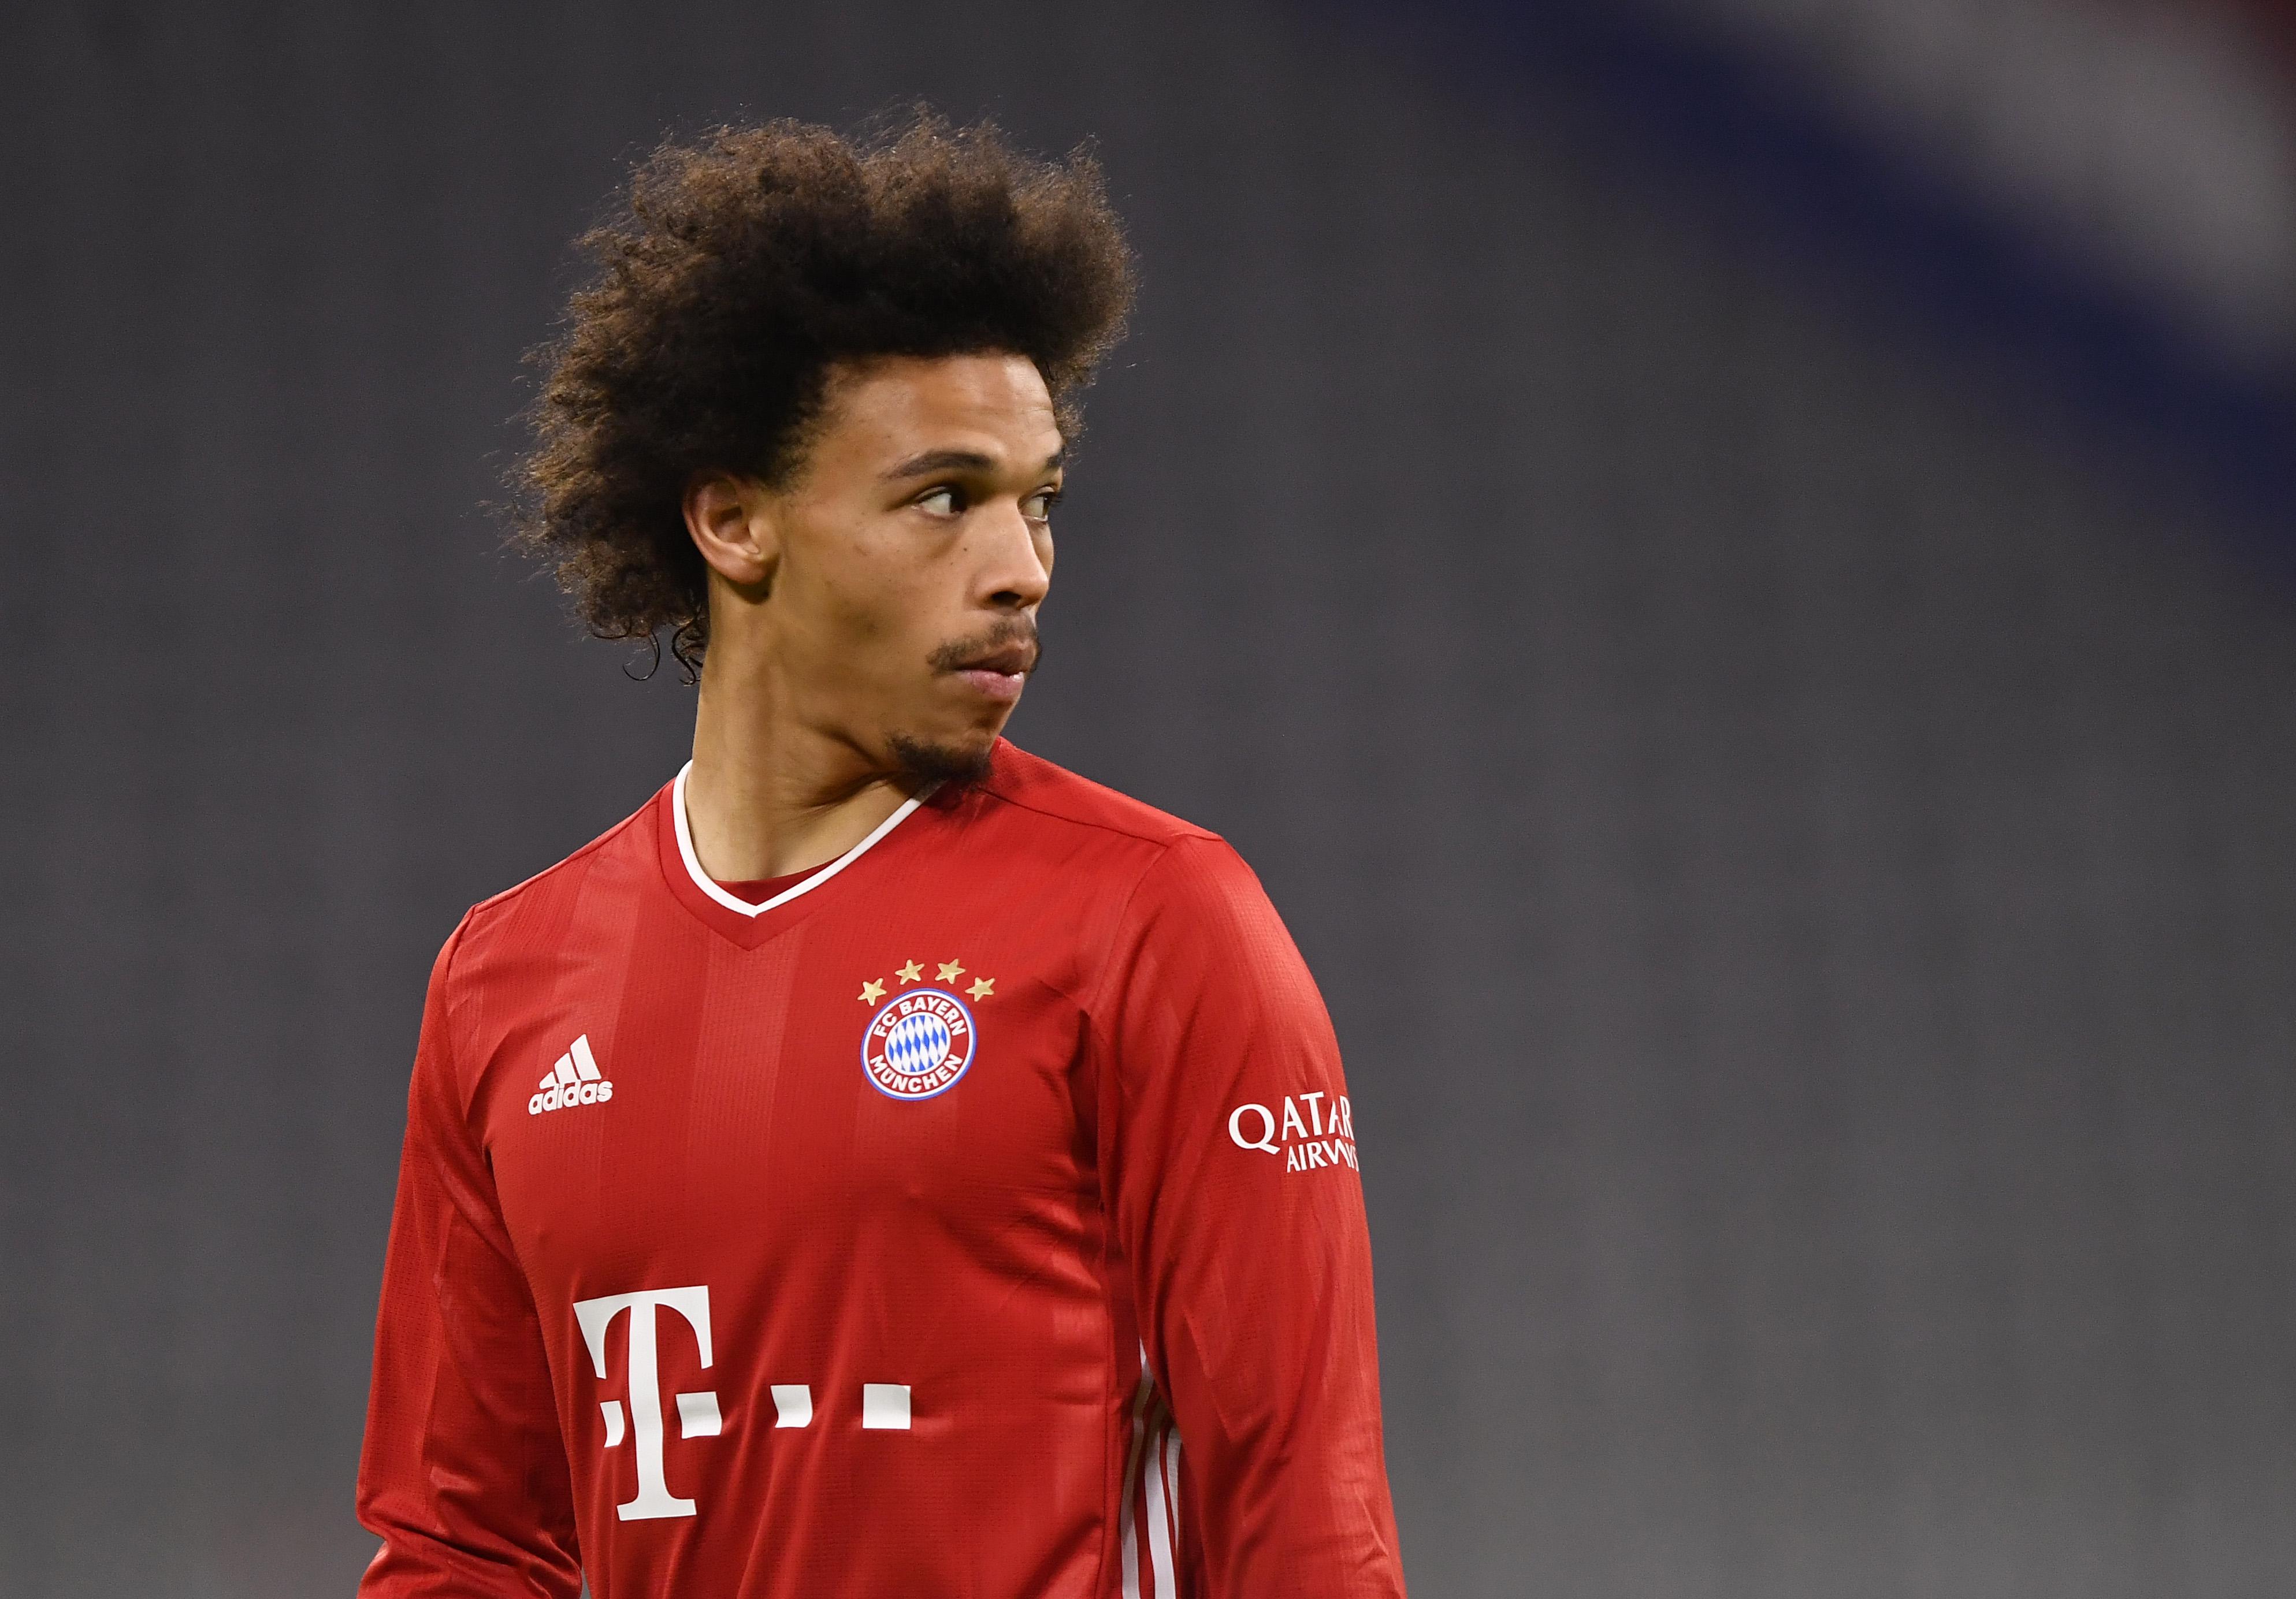 Predicted Bayern Munich Lineup Vs FC Schalke - Sane eyeing a return.